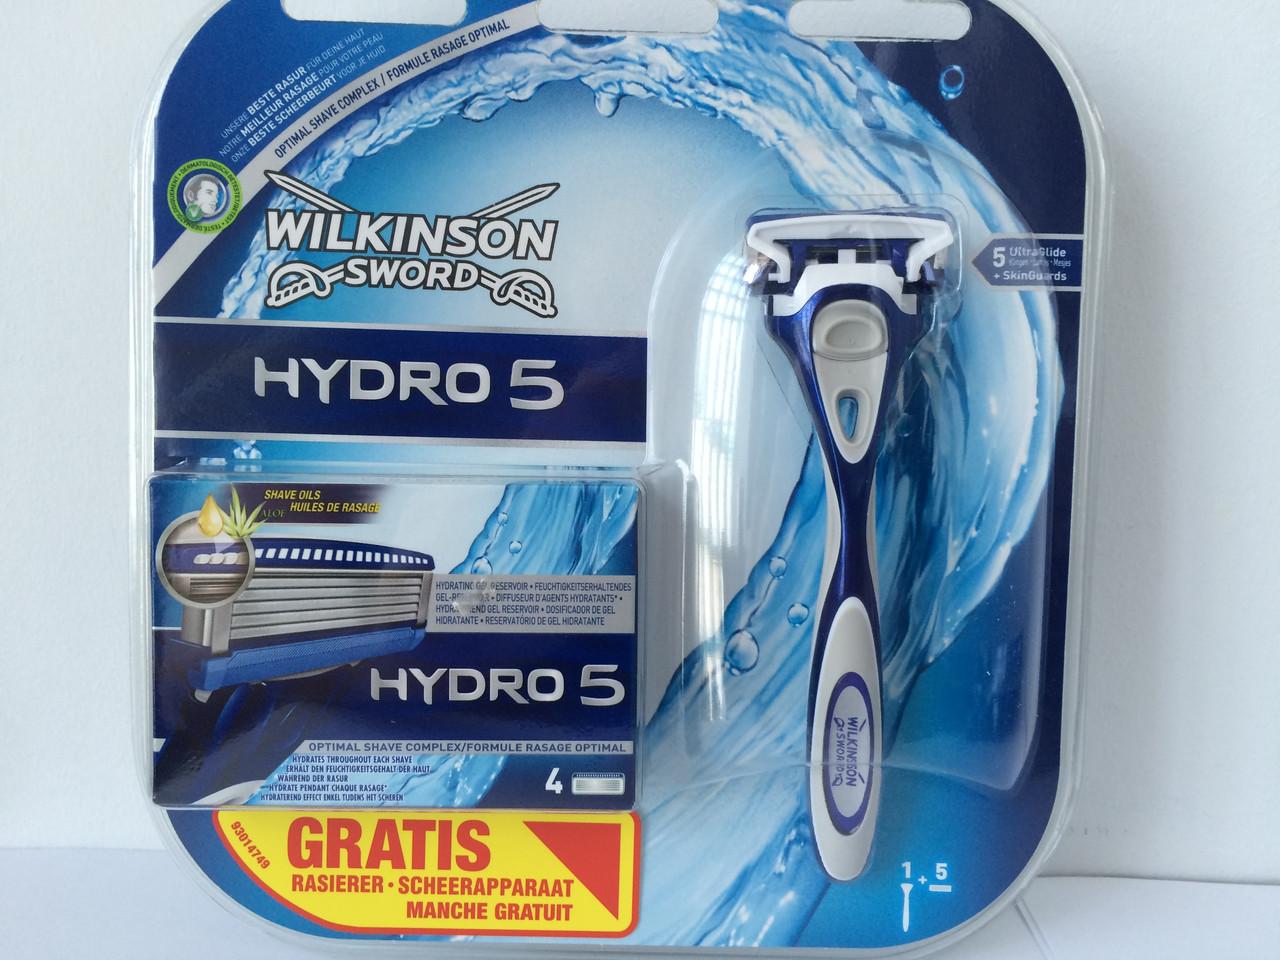 Набор для бритья мужской Wilkinson Sword Hydro 5 (Шик Вилкинсон станок + 5 катриджей) пр-во Германия